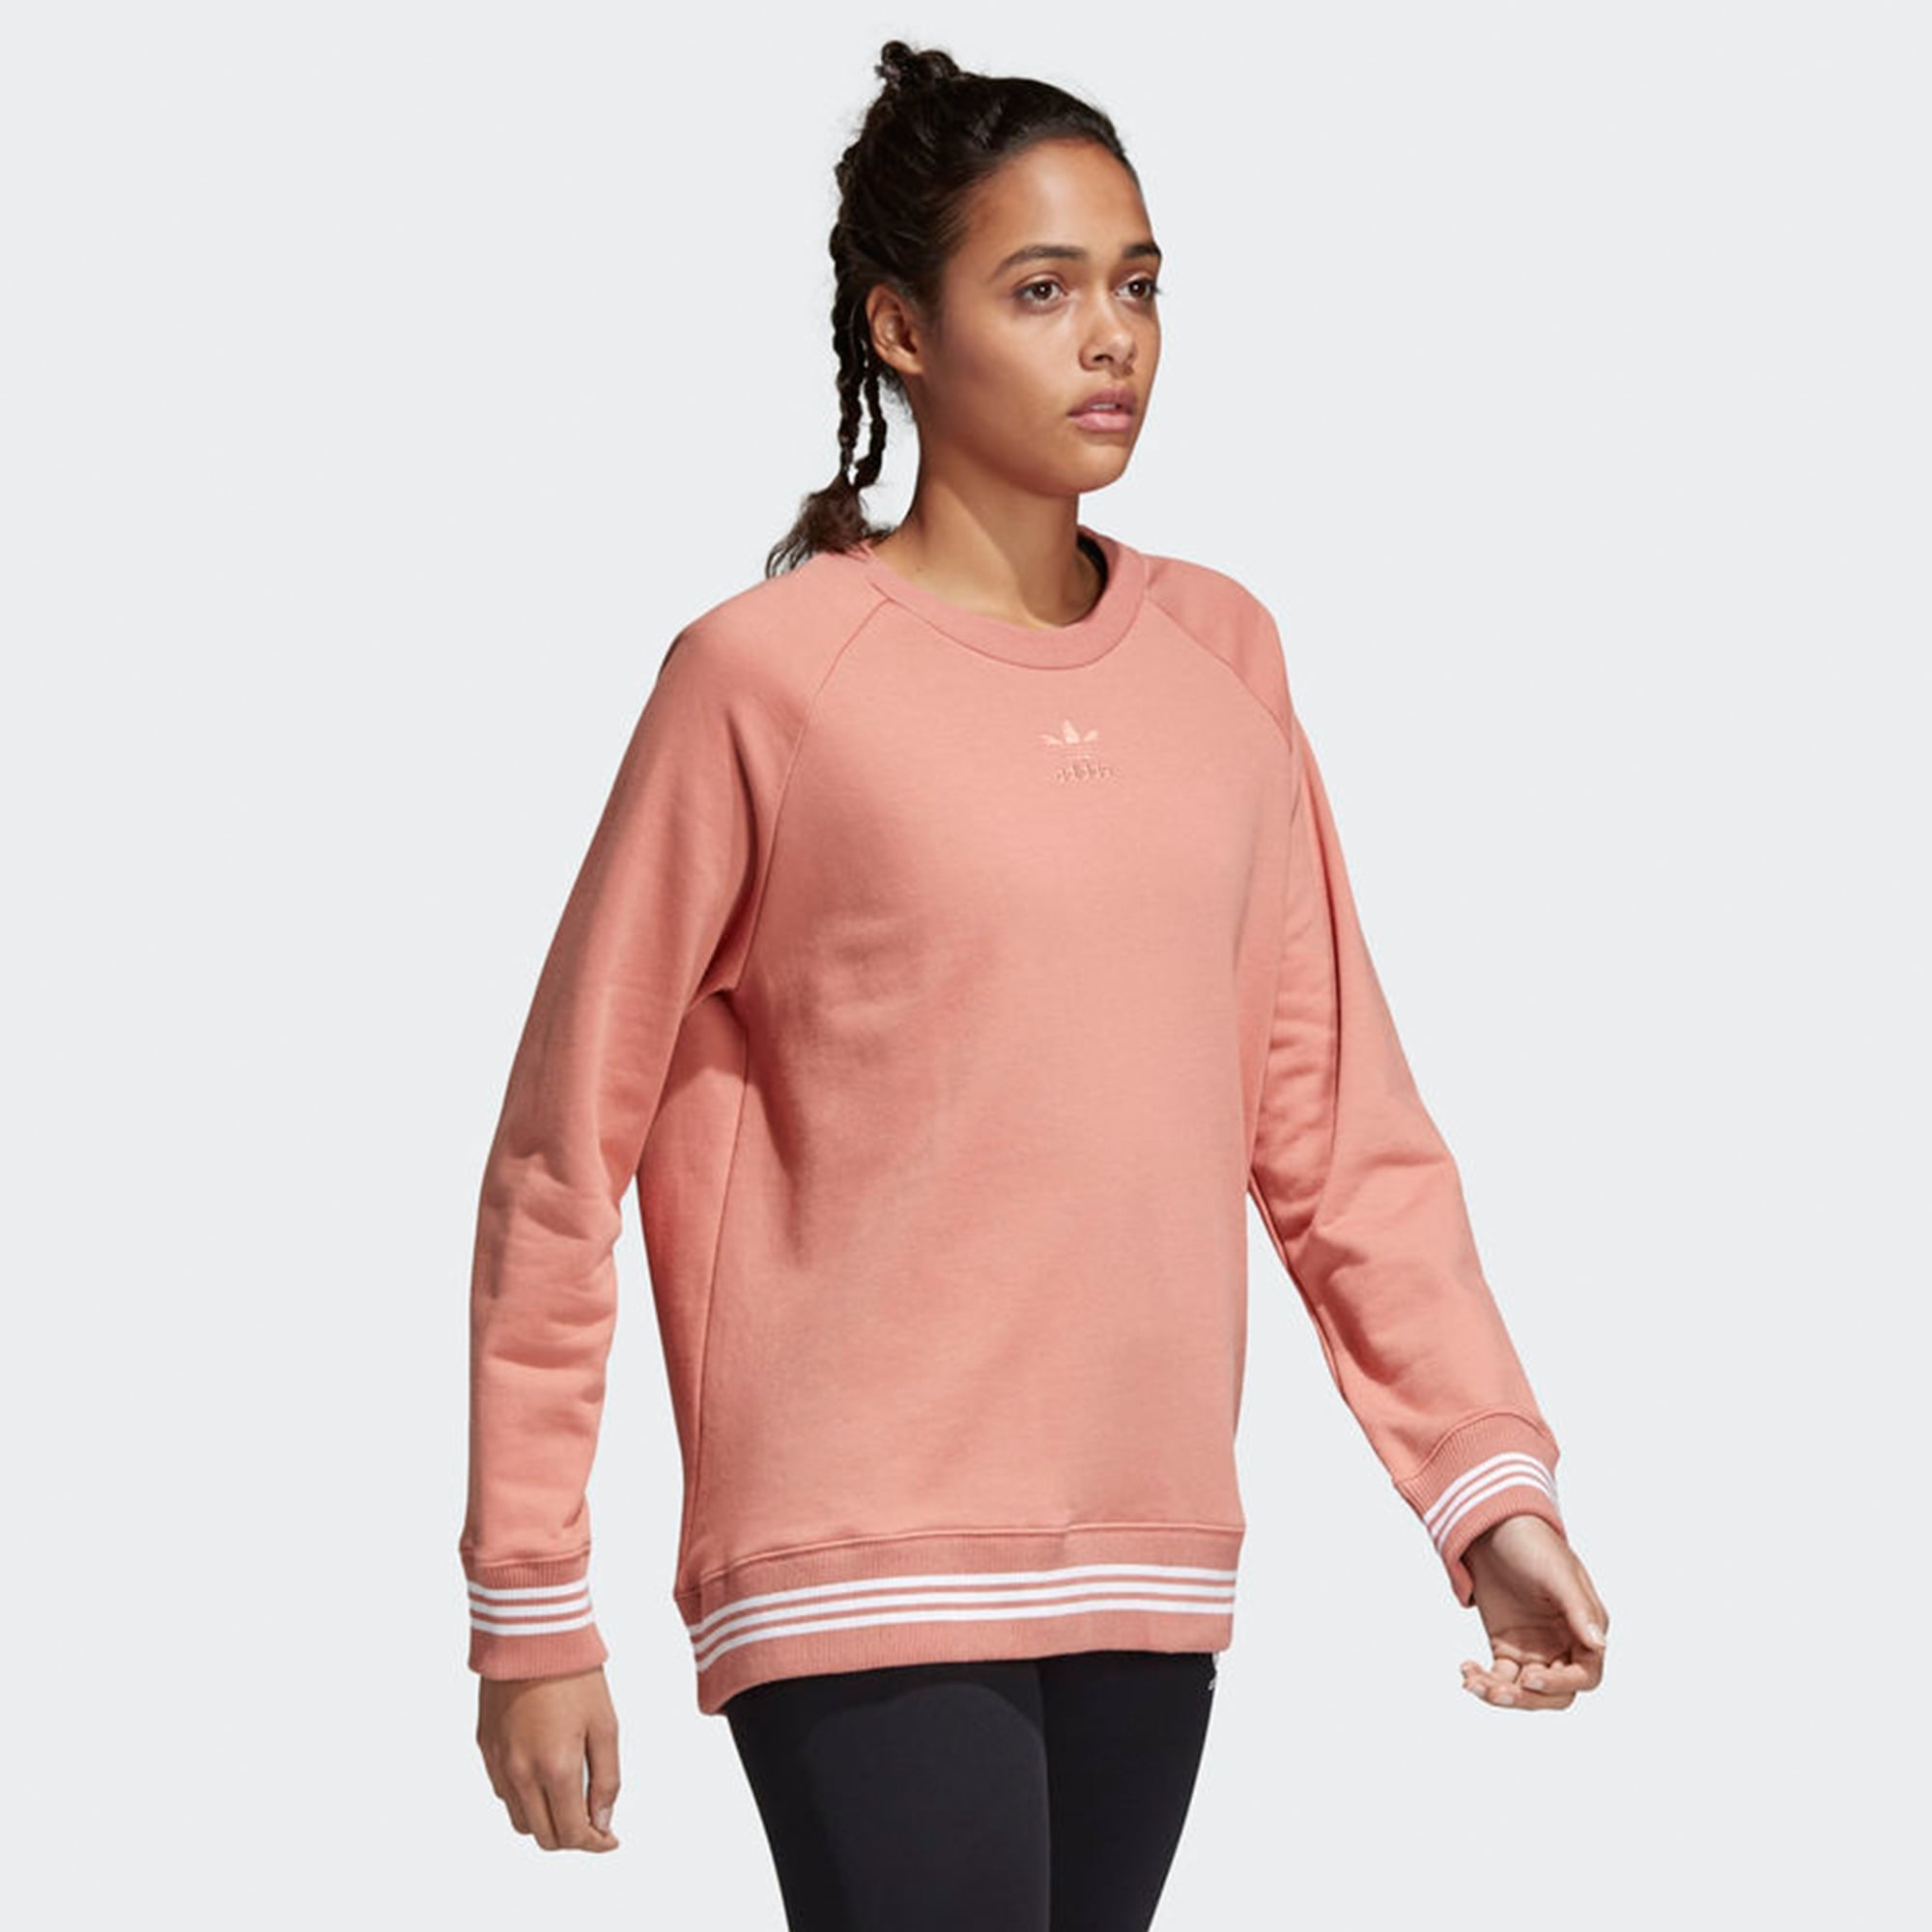 035afd7f7a73a1 Adidas Originals Pink Womens Sweatshirt | US Stockist| CD6903